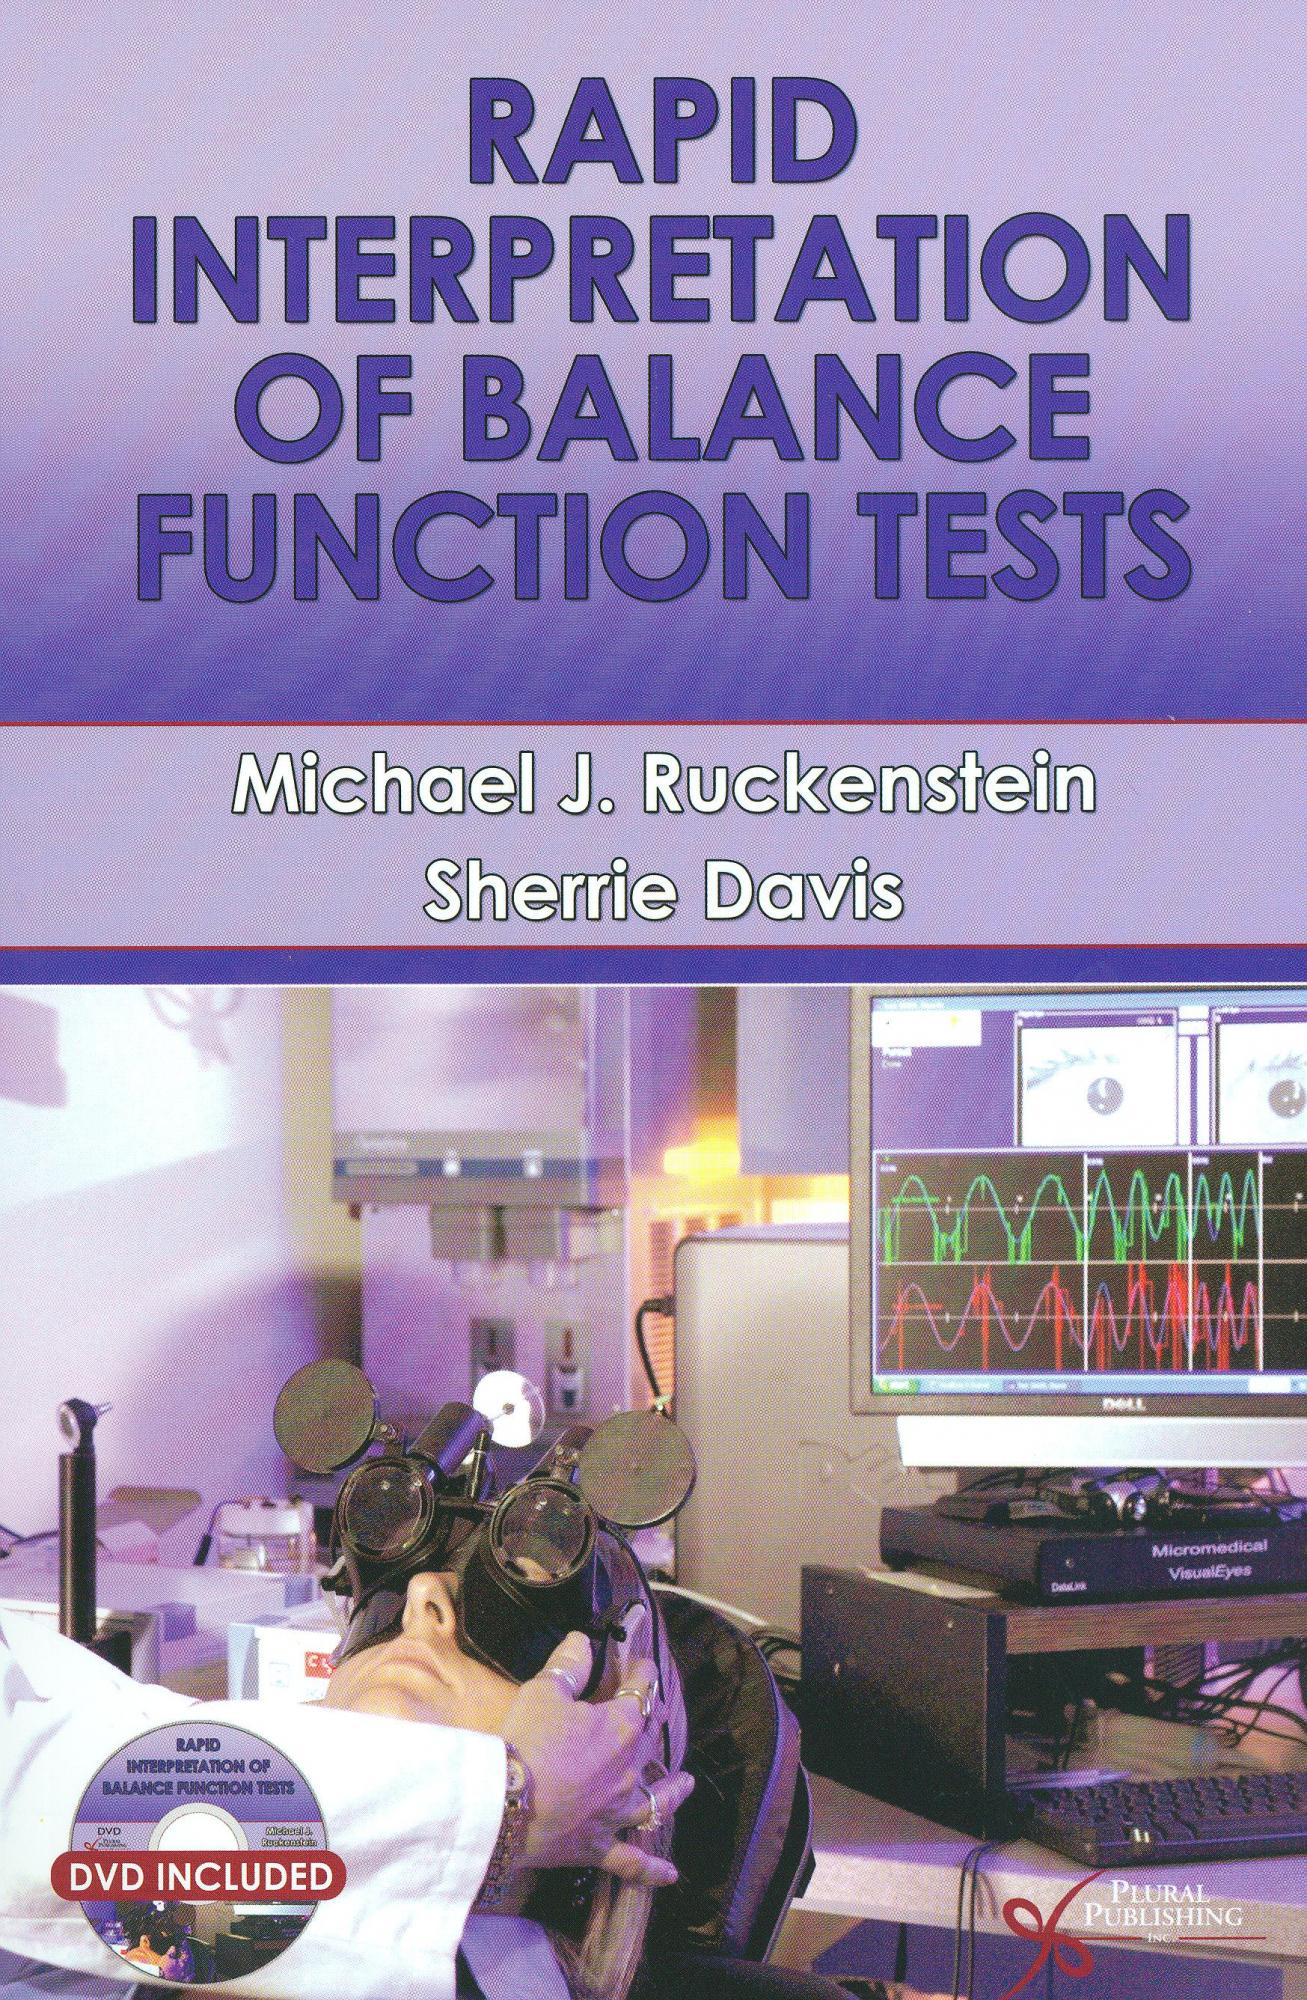 Rapid Interpretation of Balance Function